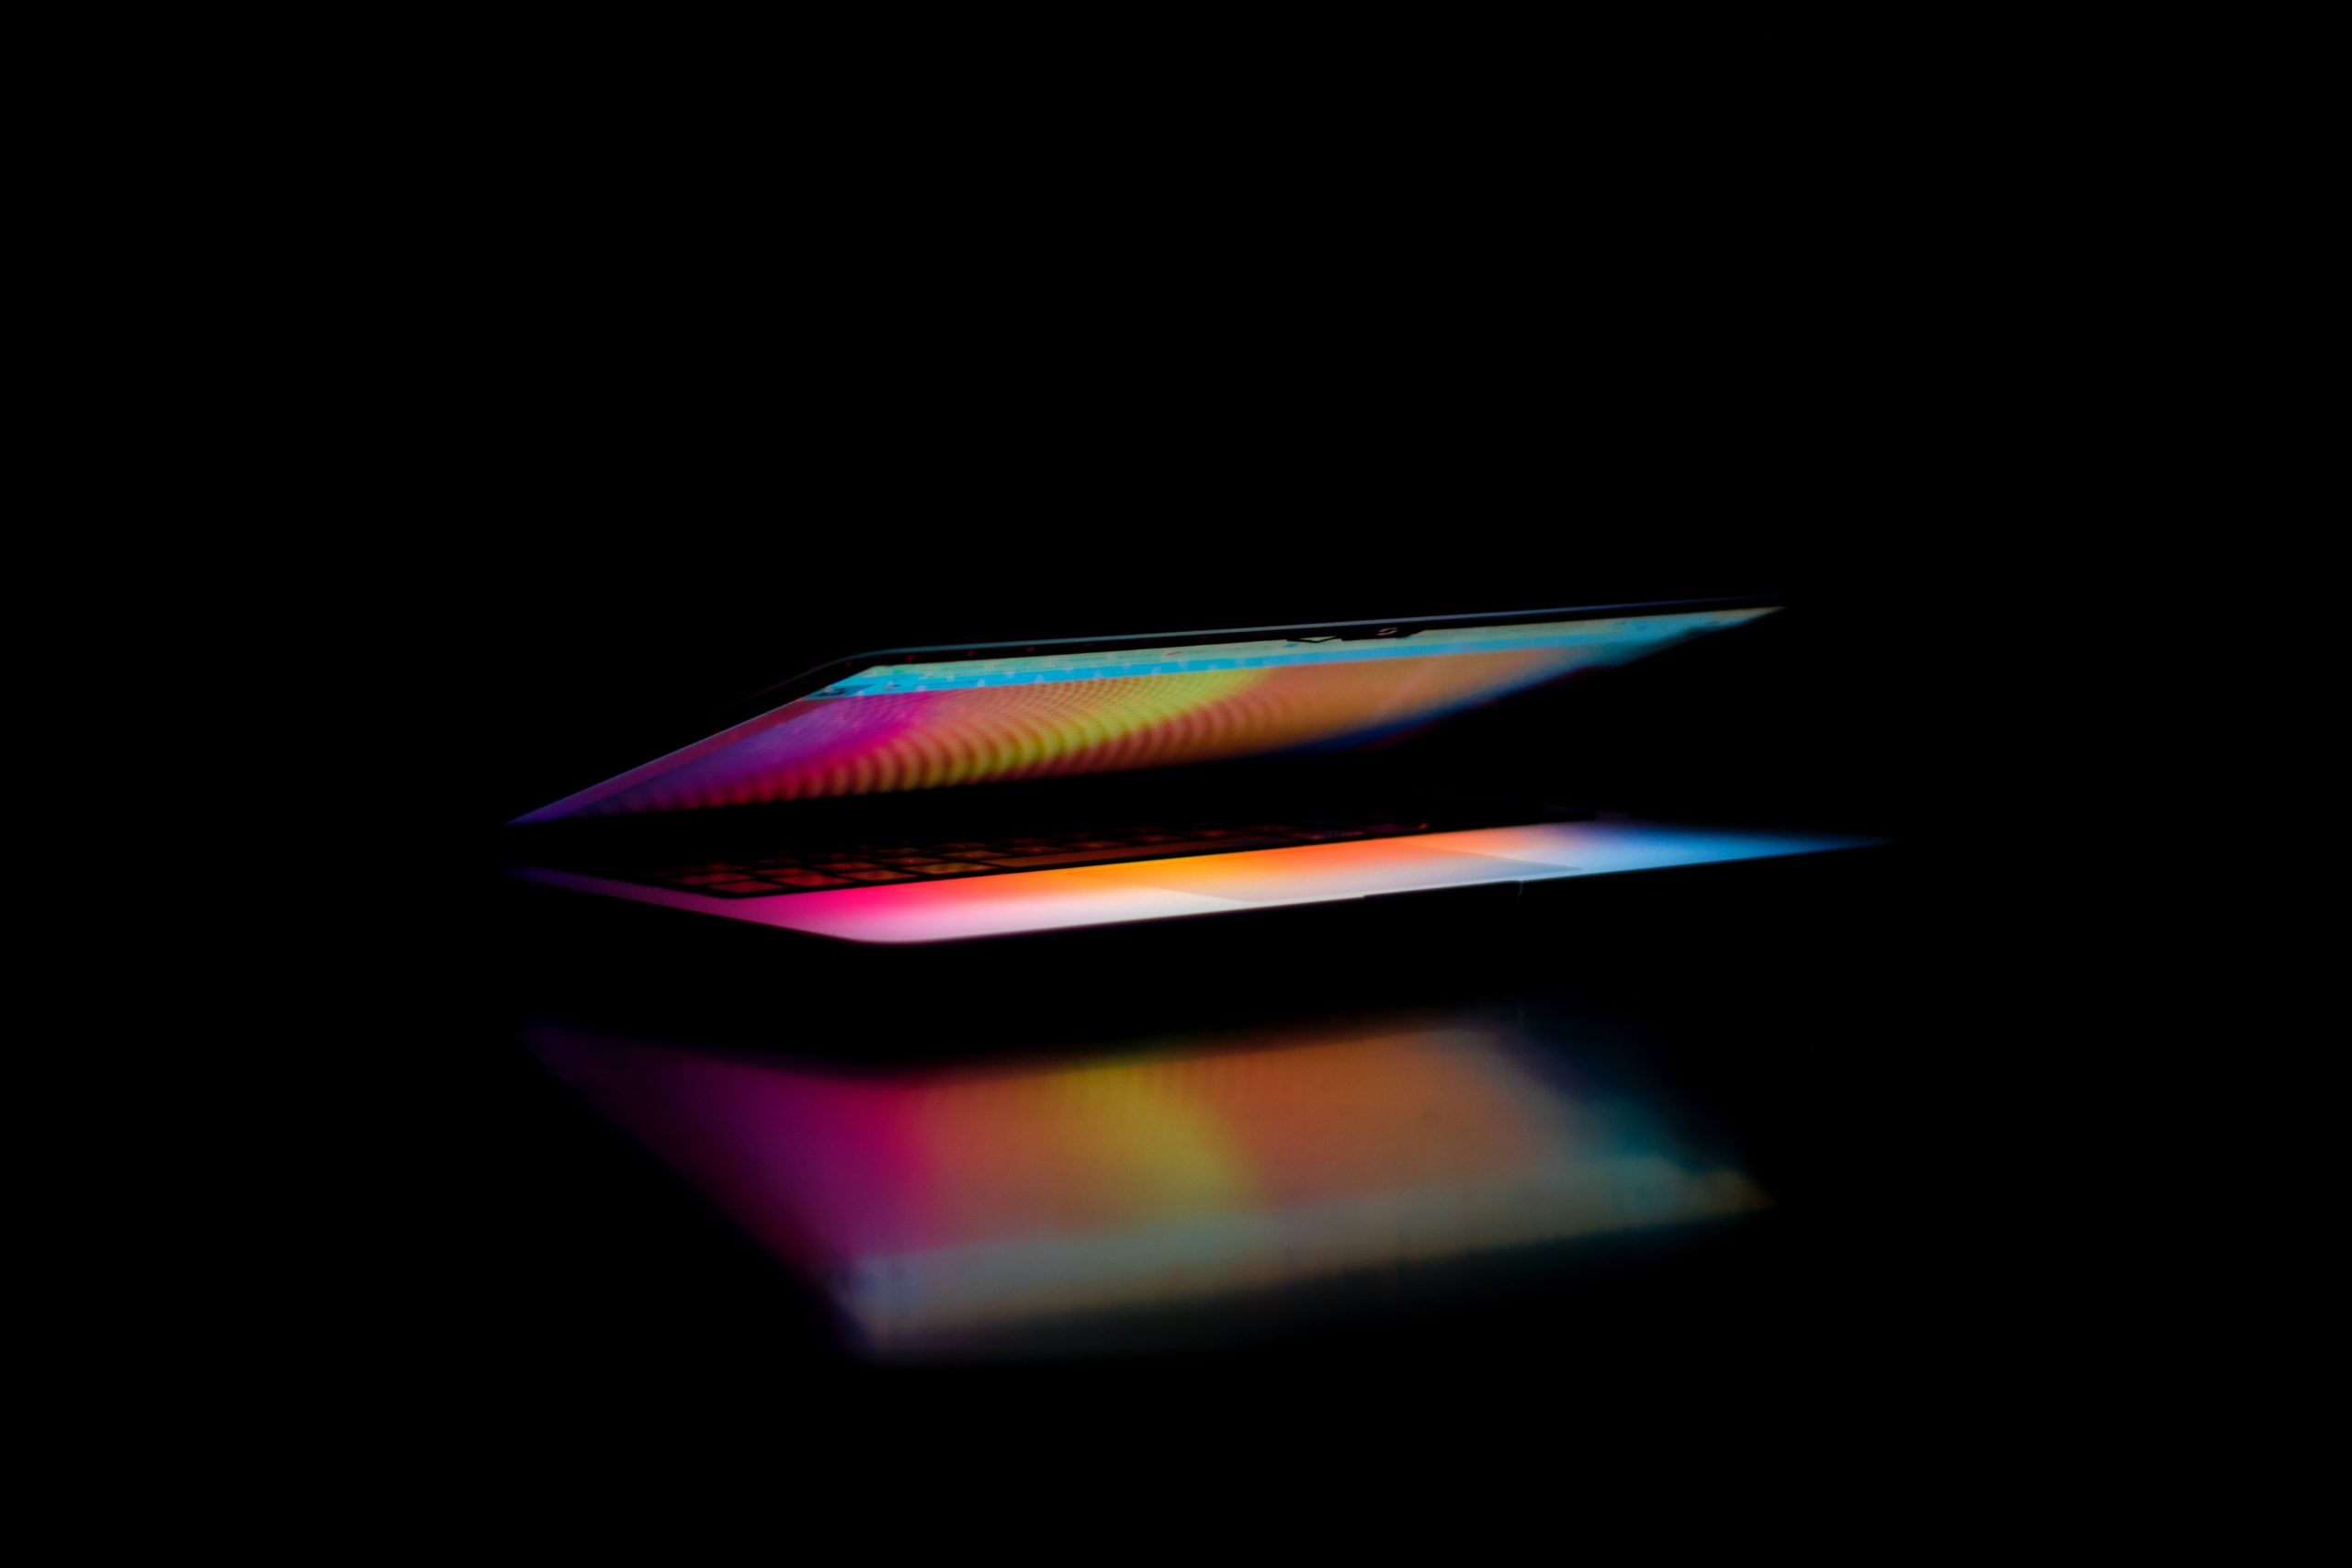 Business_Multi-Product_MacBook_Pro_16-in_iPad_Pro_12_9-in_iPhone_11_Pro_Max_iPhone_11_Pro_AU-EN_PRINT-2-min